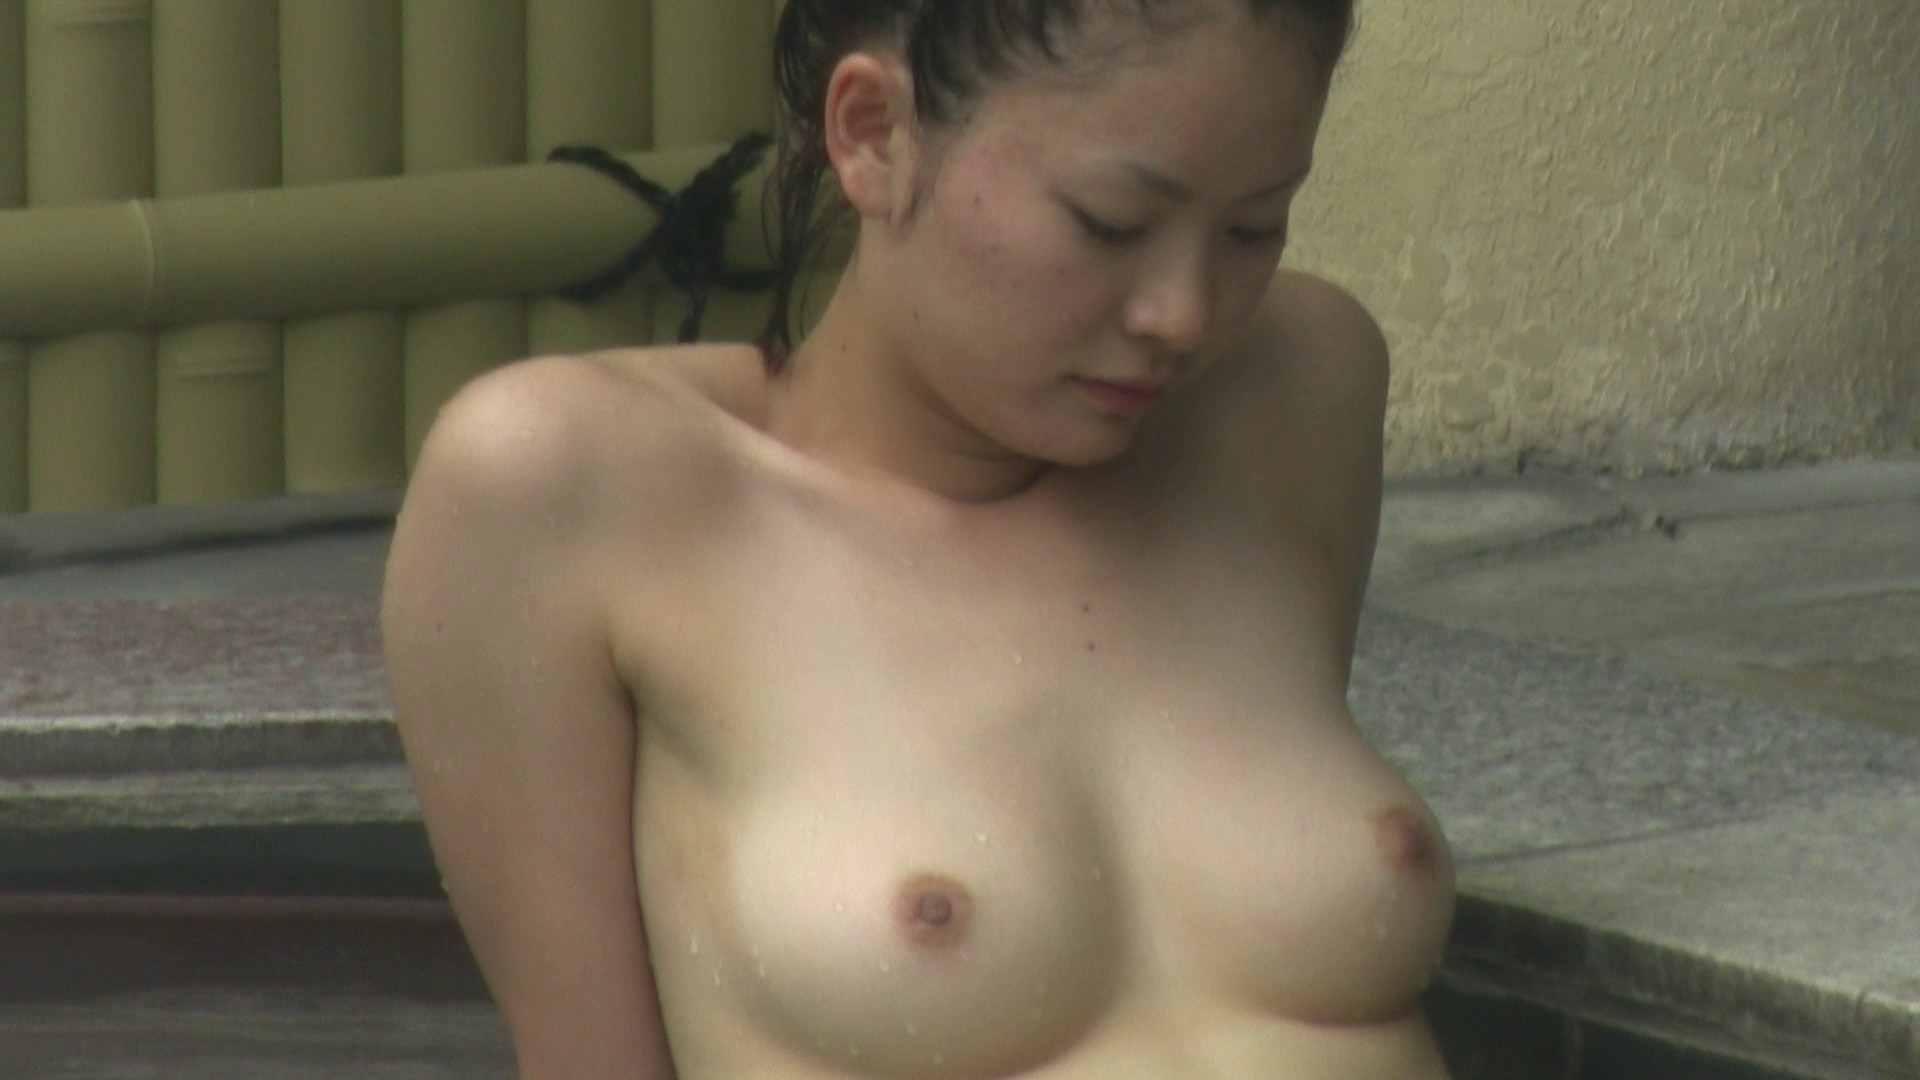 Aquaな露天風呂Vol.137 盗撮特撮  12pic 6